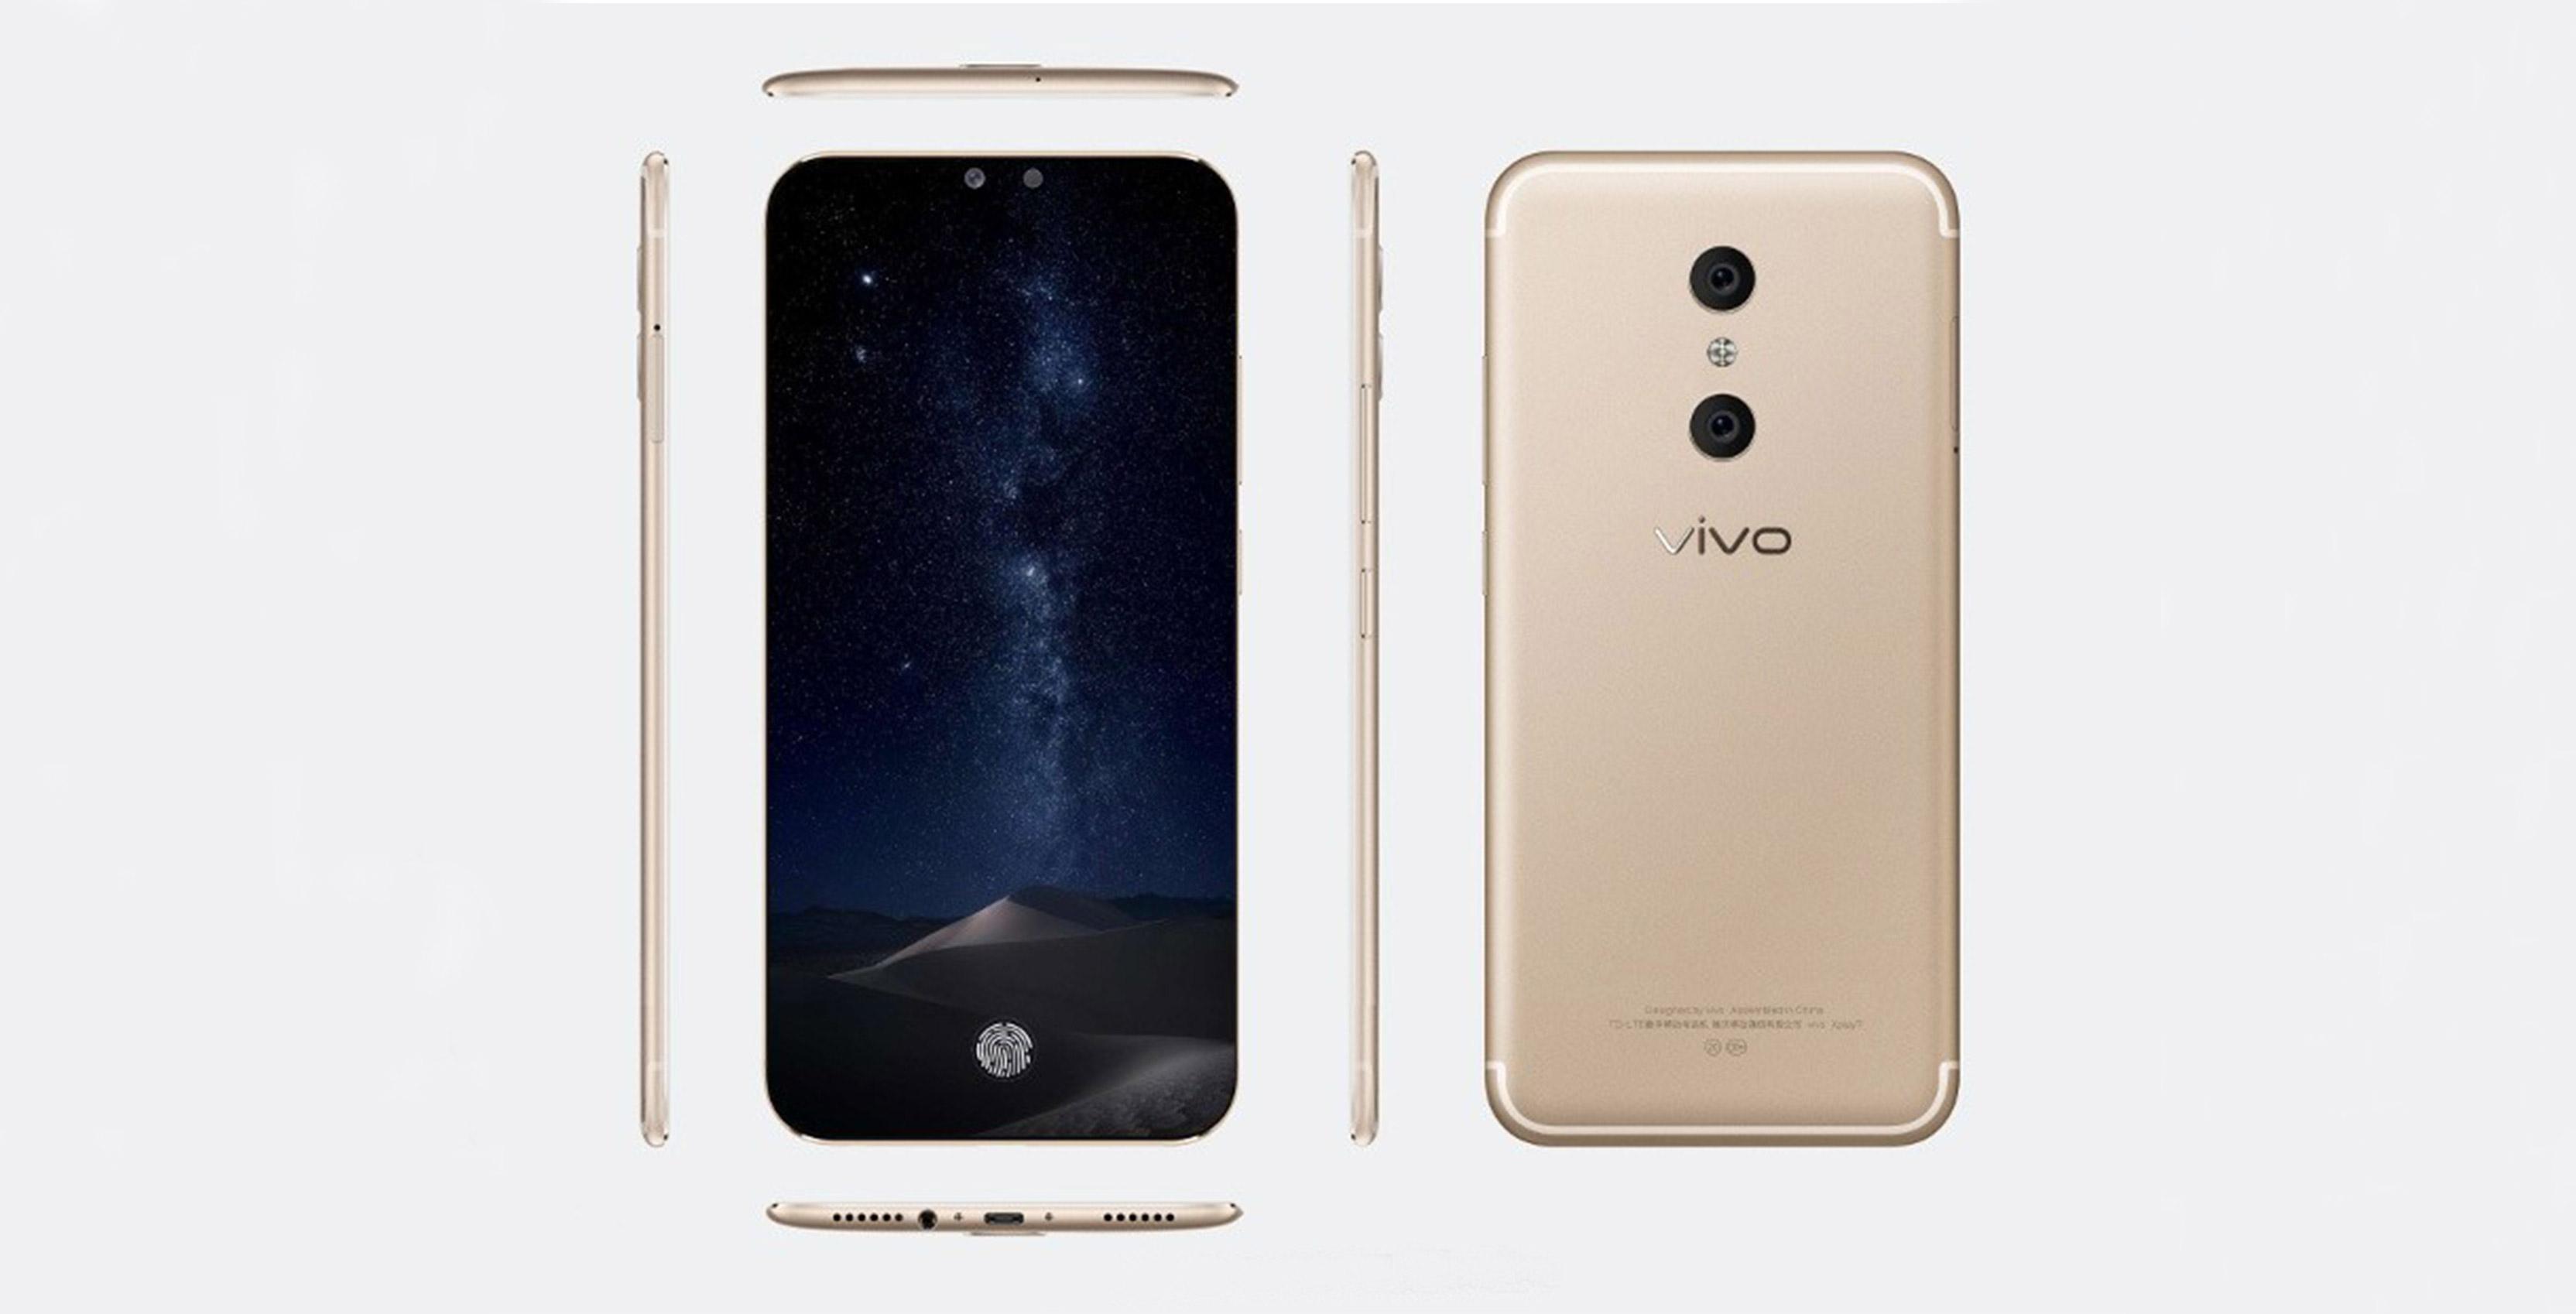 Vivo's upcoming Xplay 7 smartphone